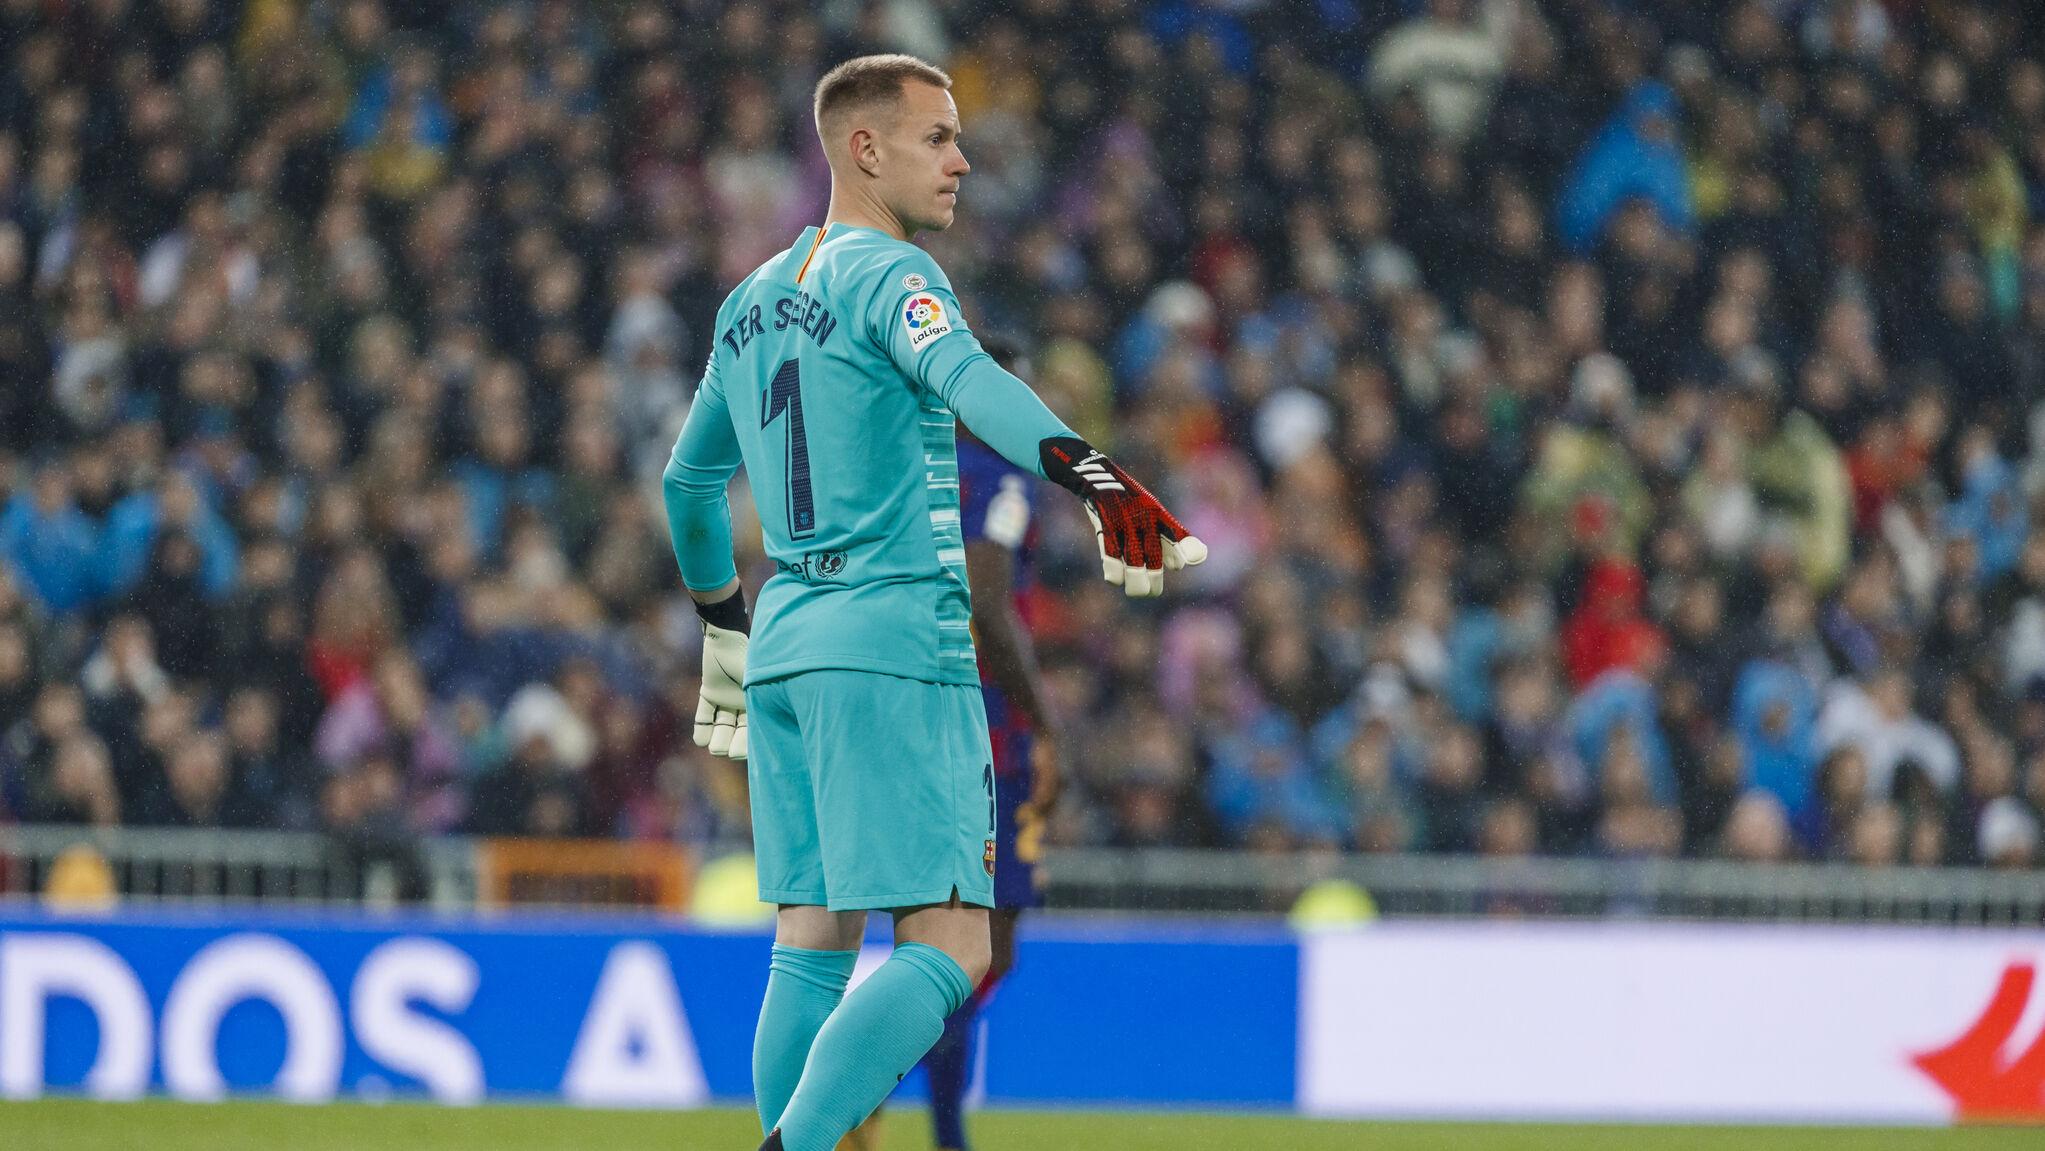 Ranked: The Barcelona players with the highest market value - Bóng Đá